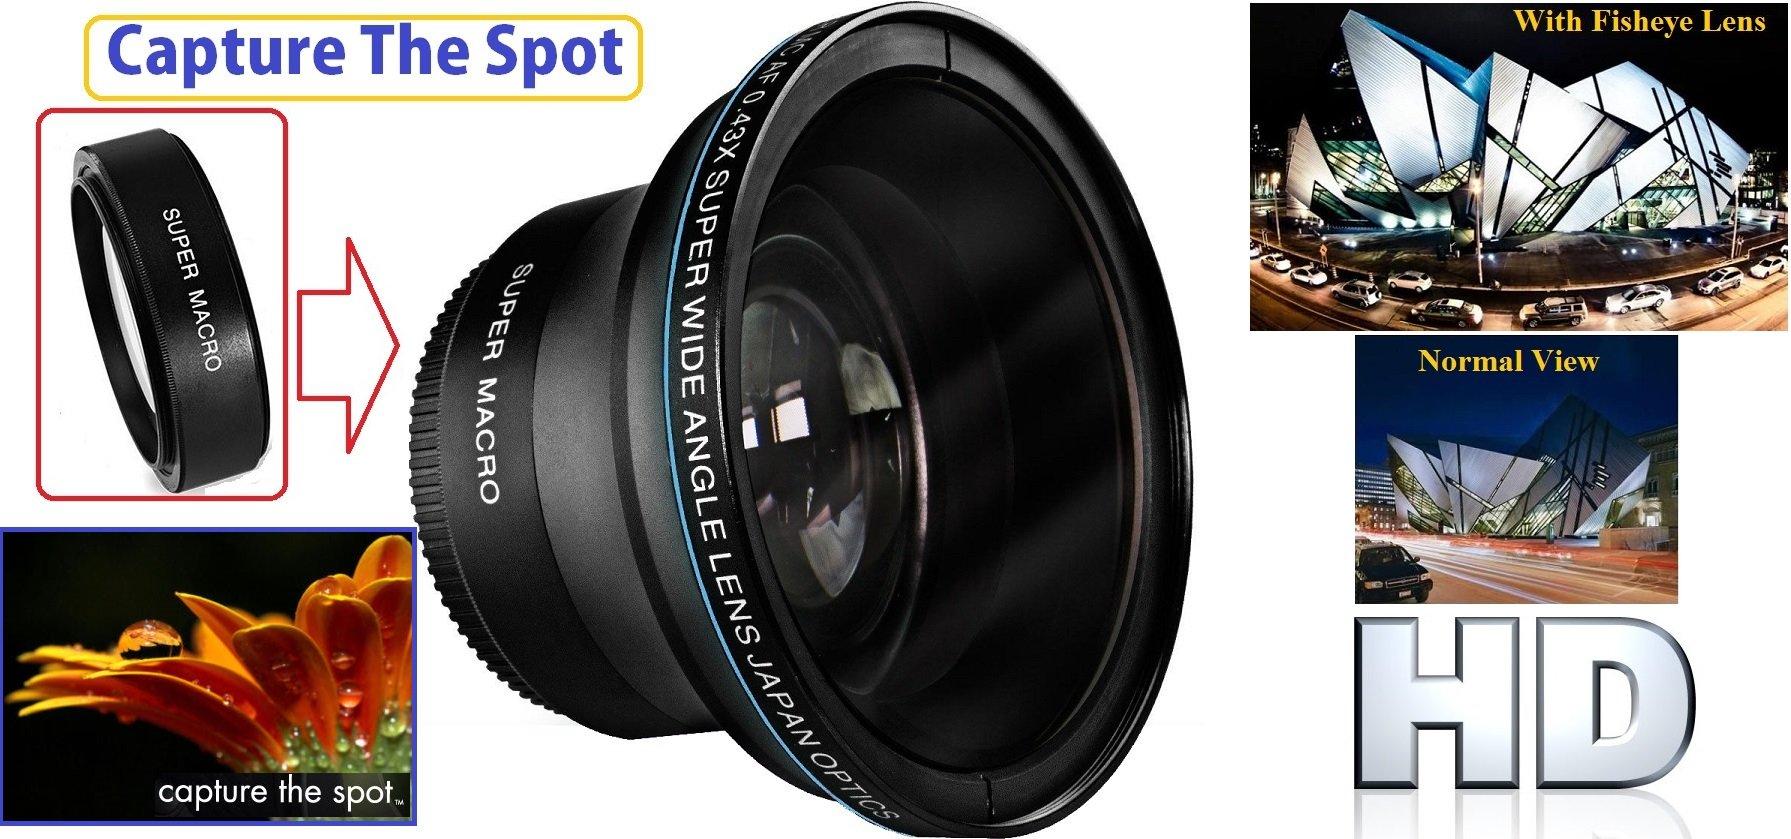 Professional HD MK III Fisheye Lens for Canon Vixia HF M41 M500 M400 M40 R72 R700 R70 R600 R62 R60 M52 by HD Lens